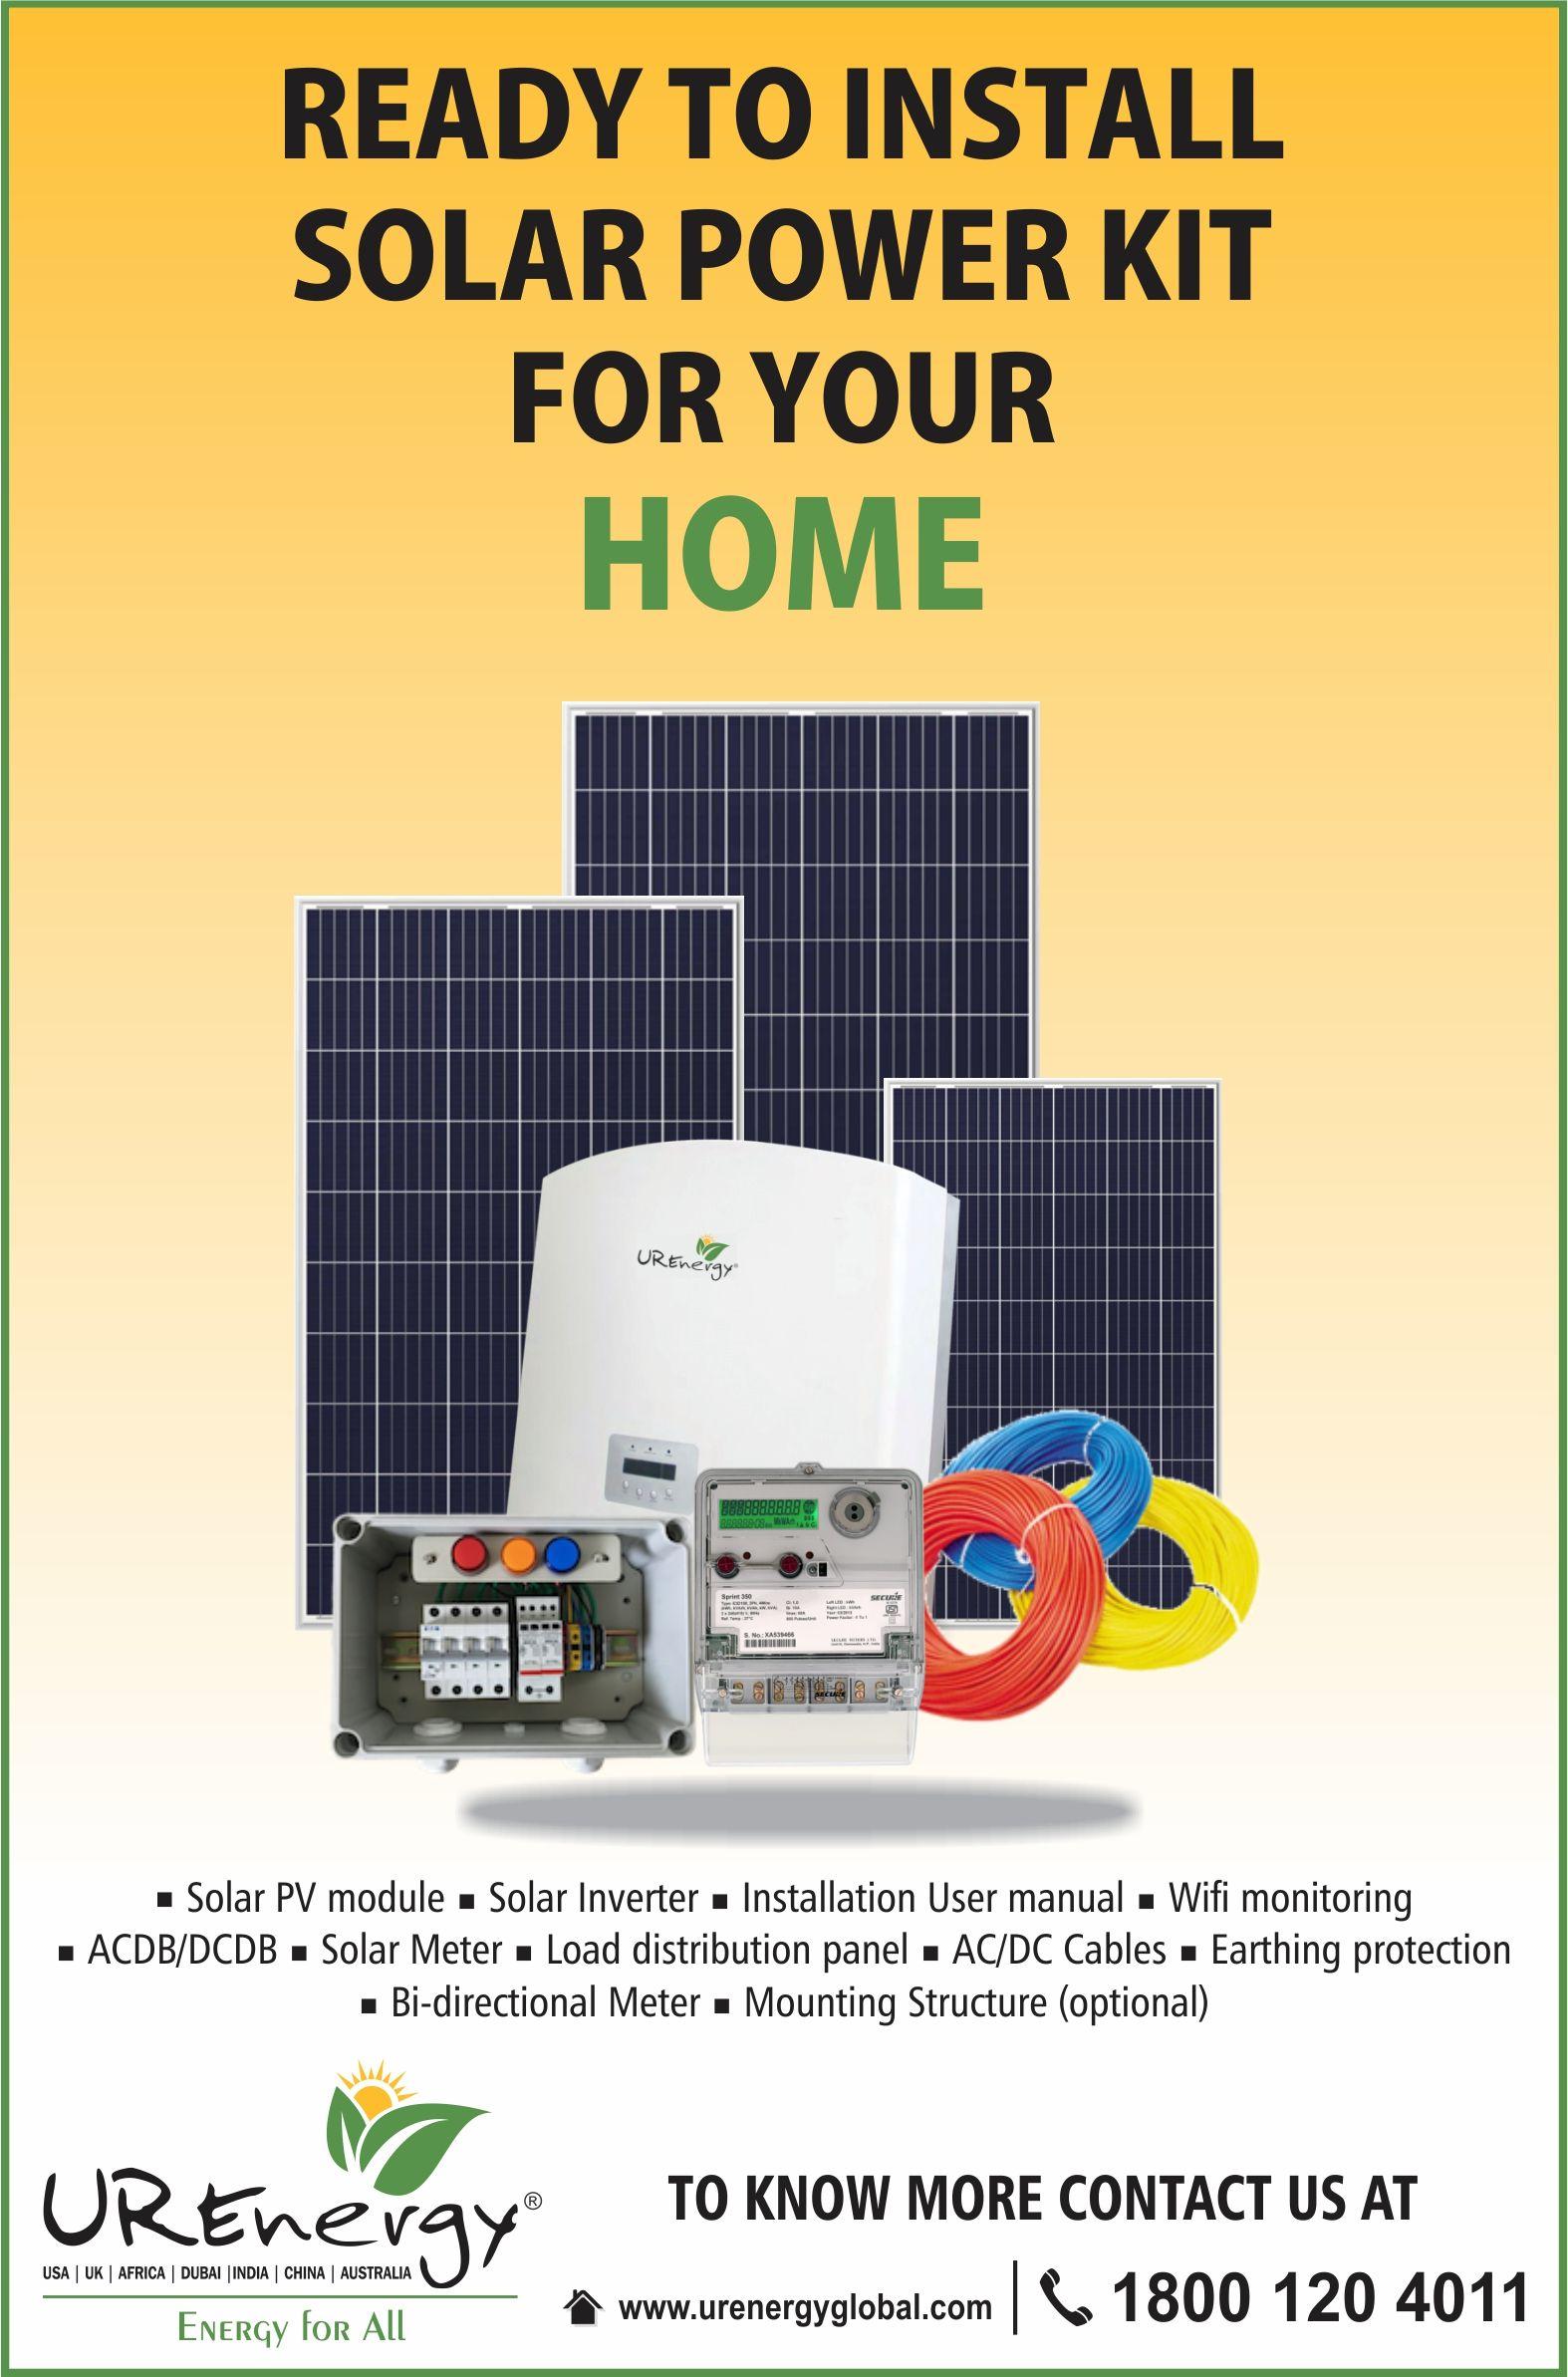 Rooftop Solar Panel Inverters Water Pump Solar Epc Gujarat India U R Energy Solar Power Kits Solar Panel Inverter Solar Panel Cost